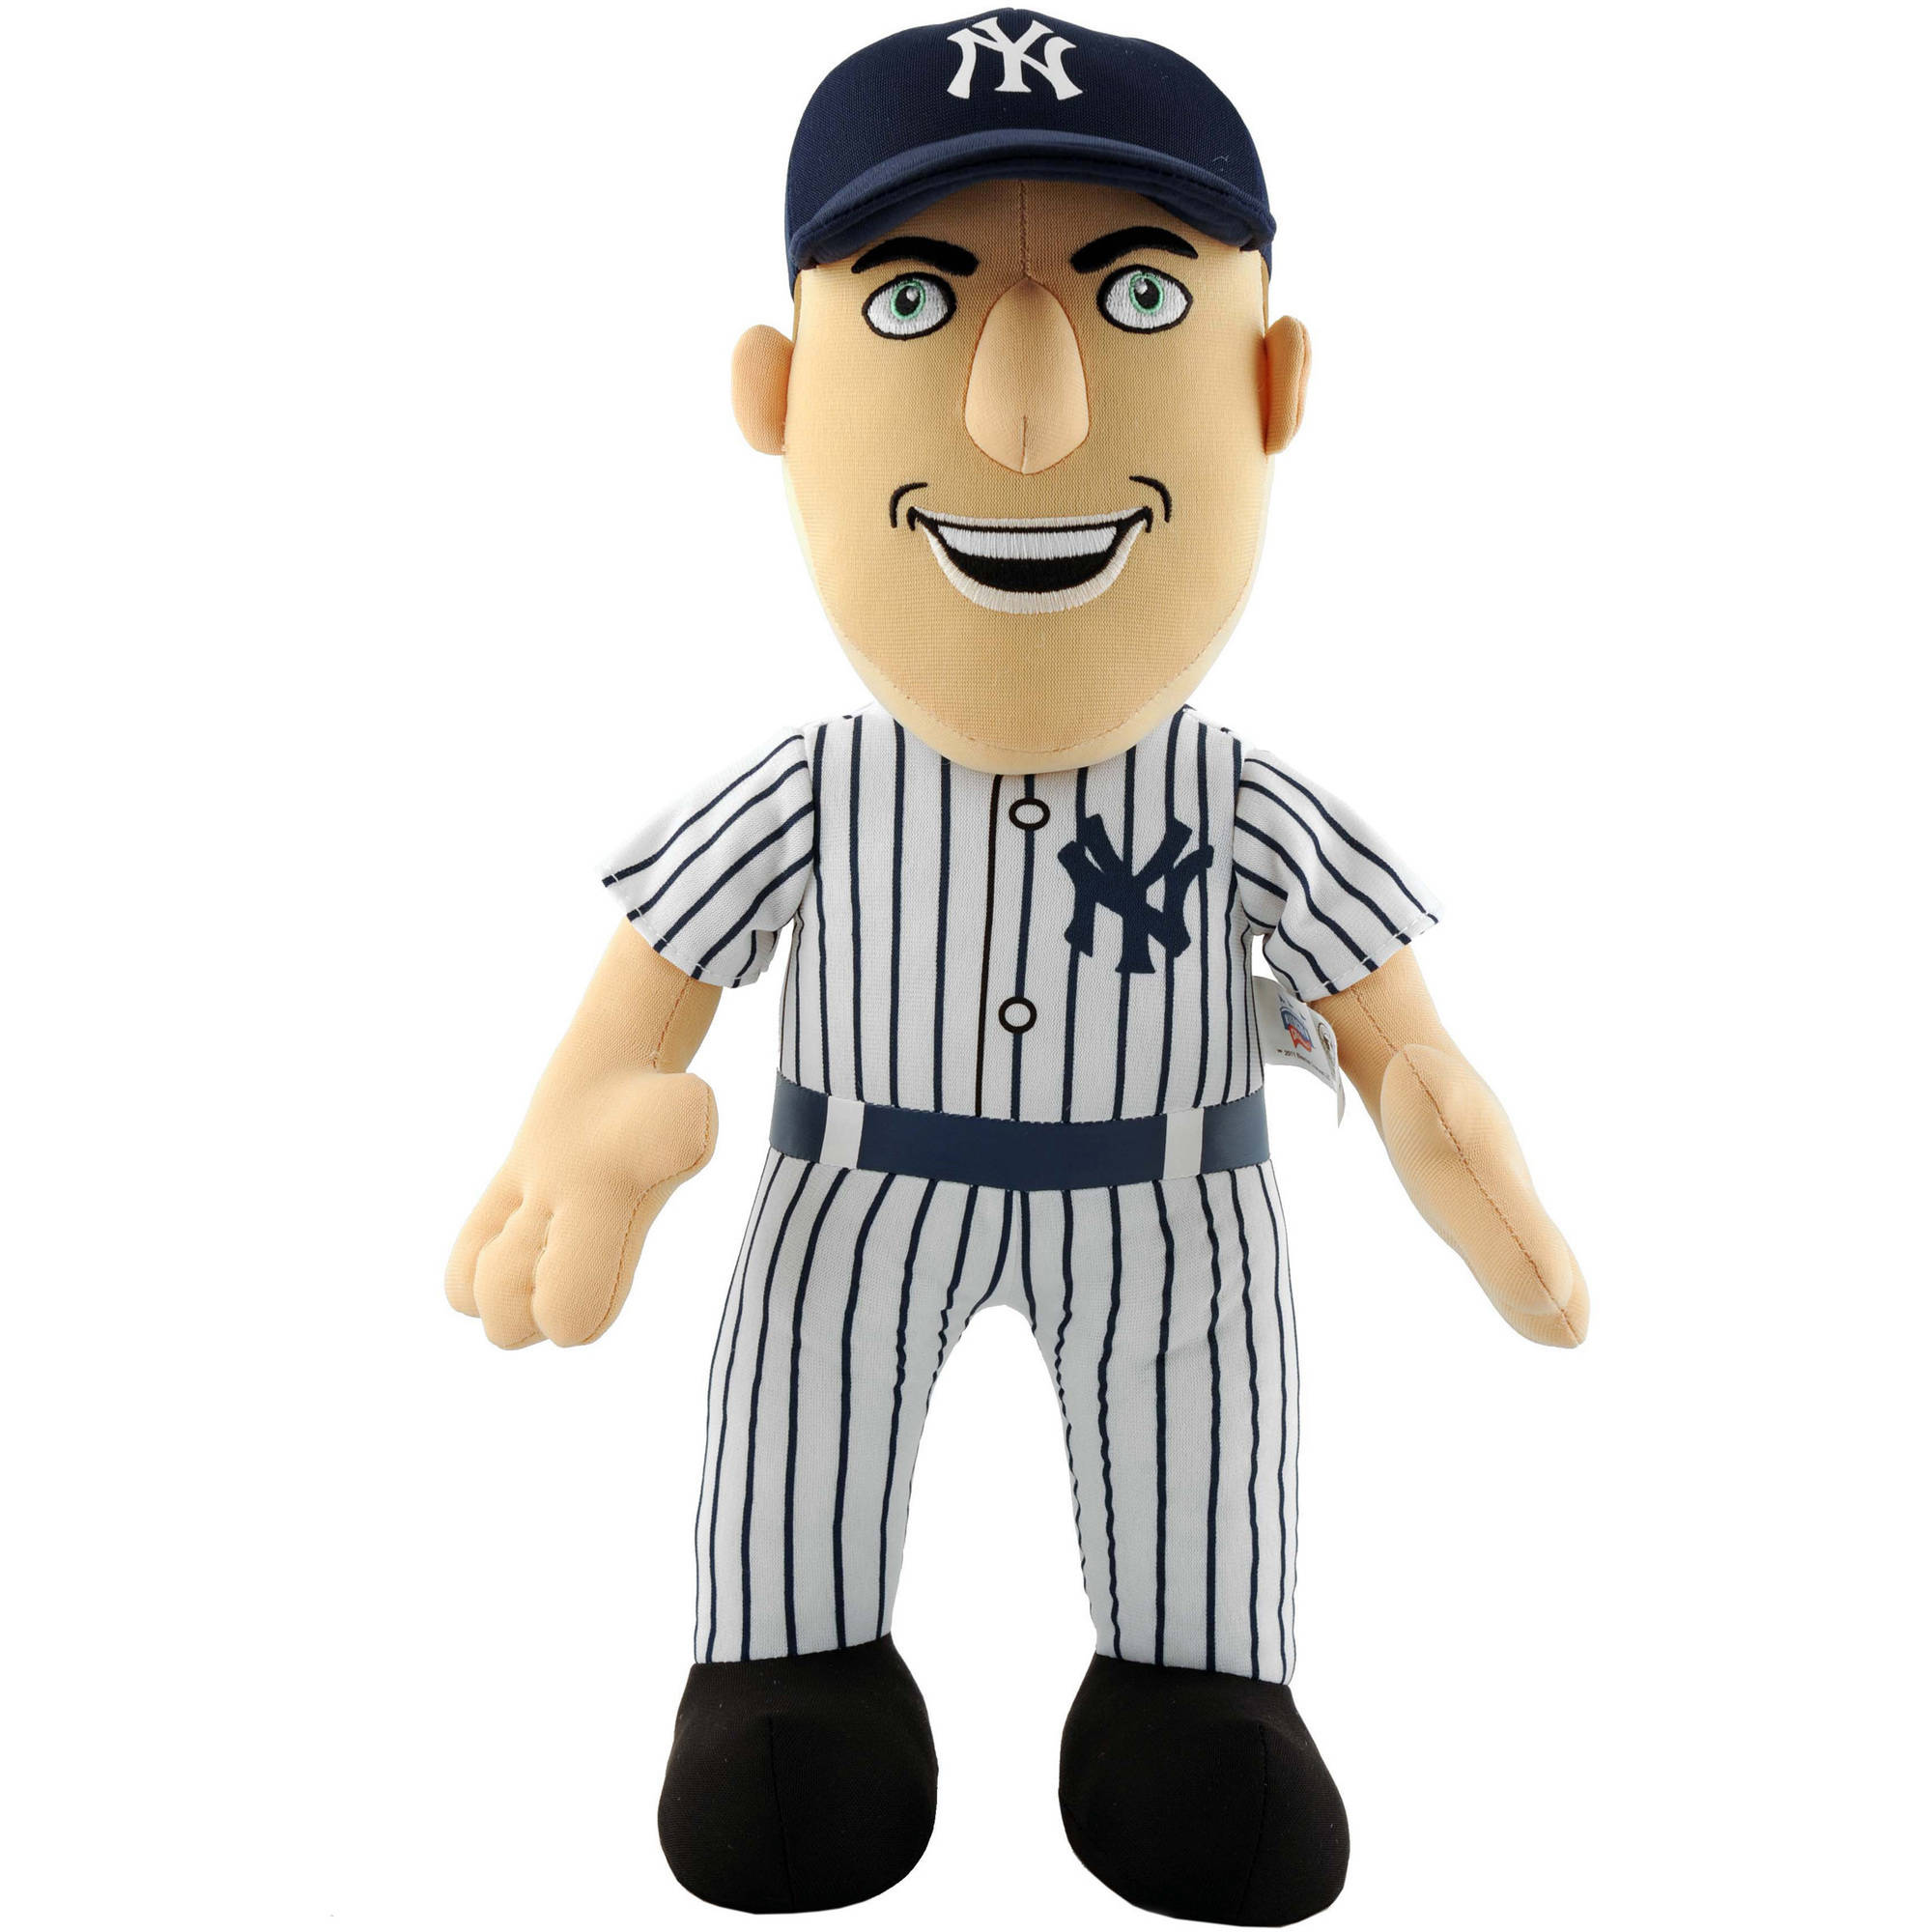 "Bleacher Creatures MLB 14"" Plush Doll, Alex Rodriguez, New York Yankees"